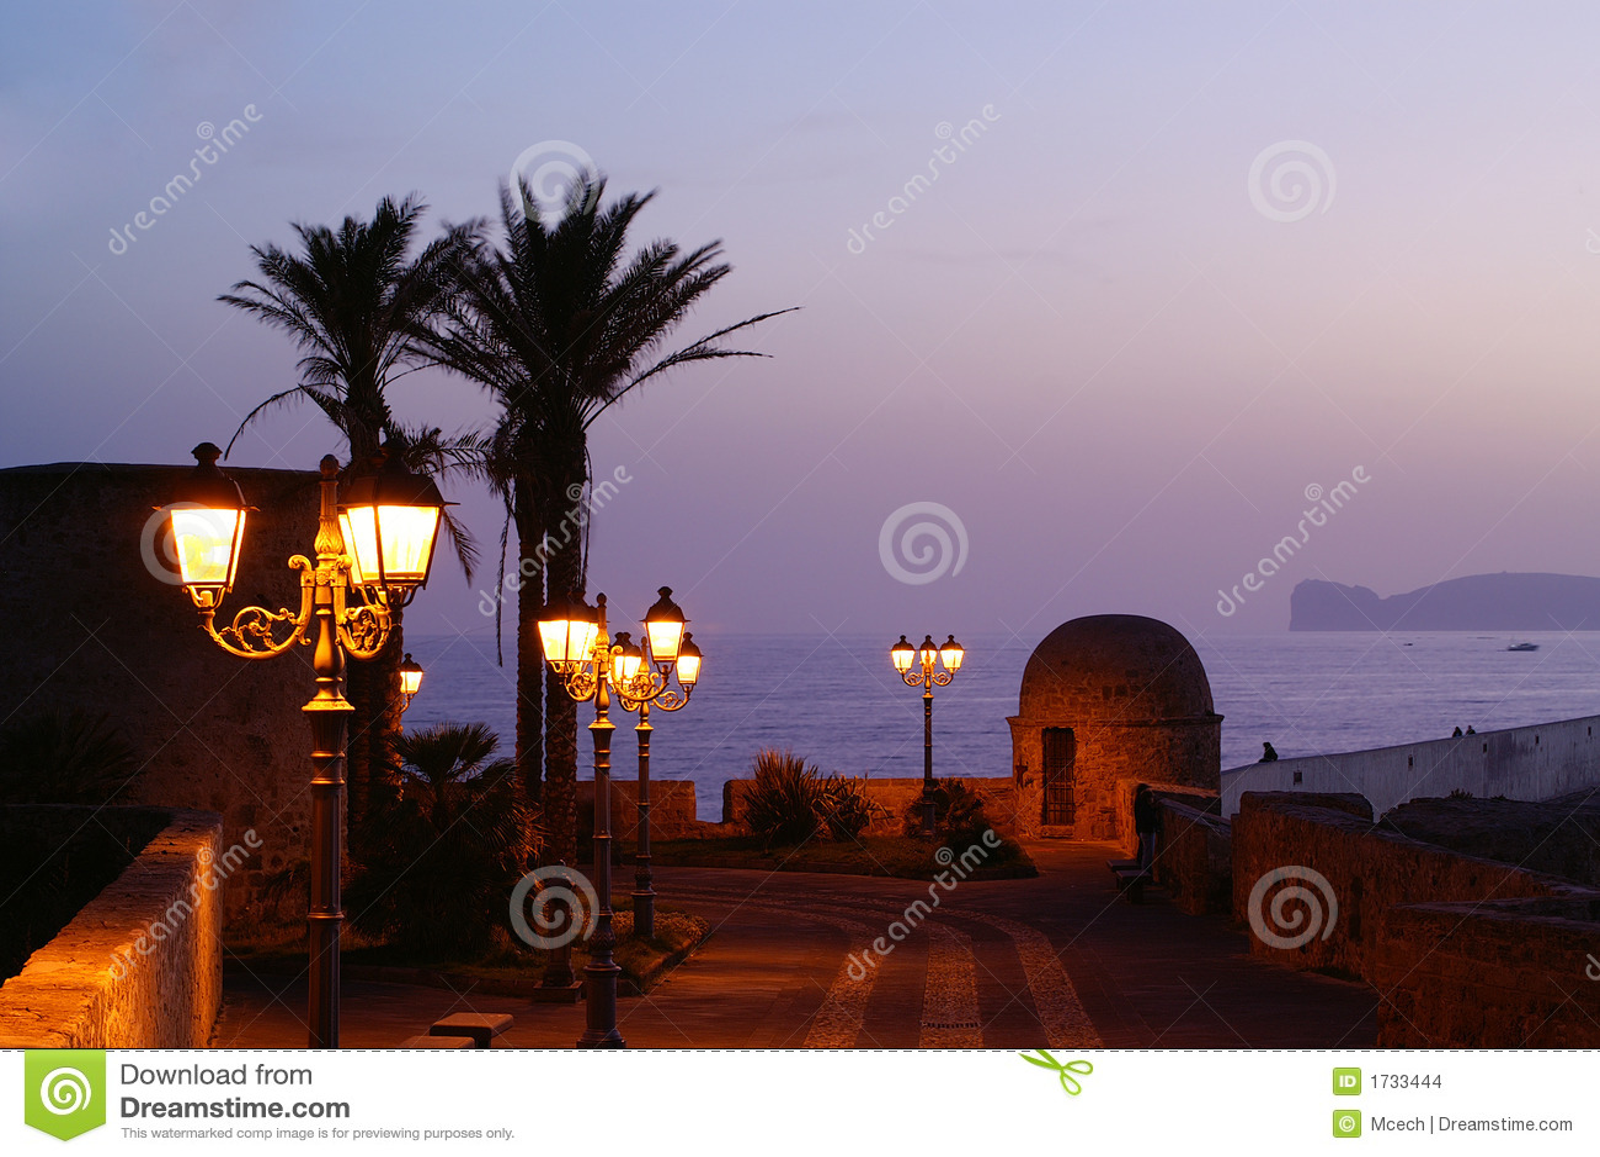 Alghero in night.